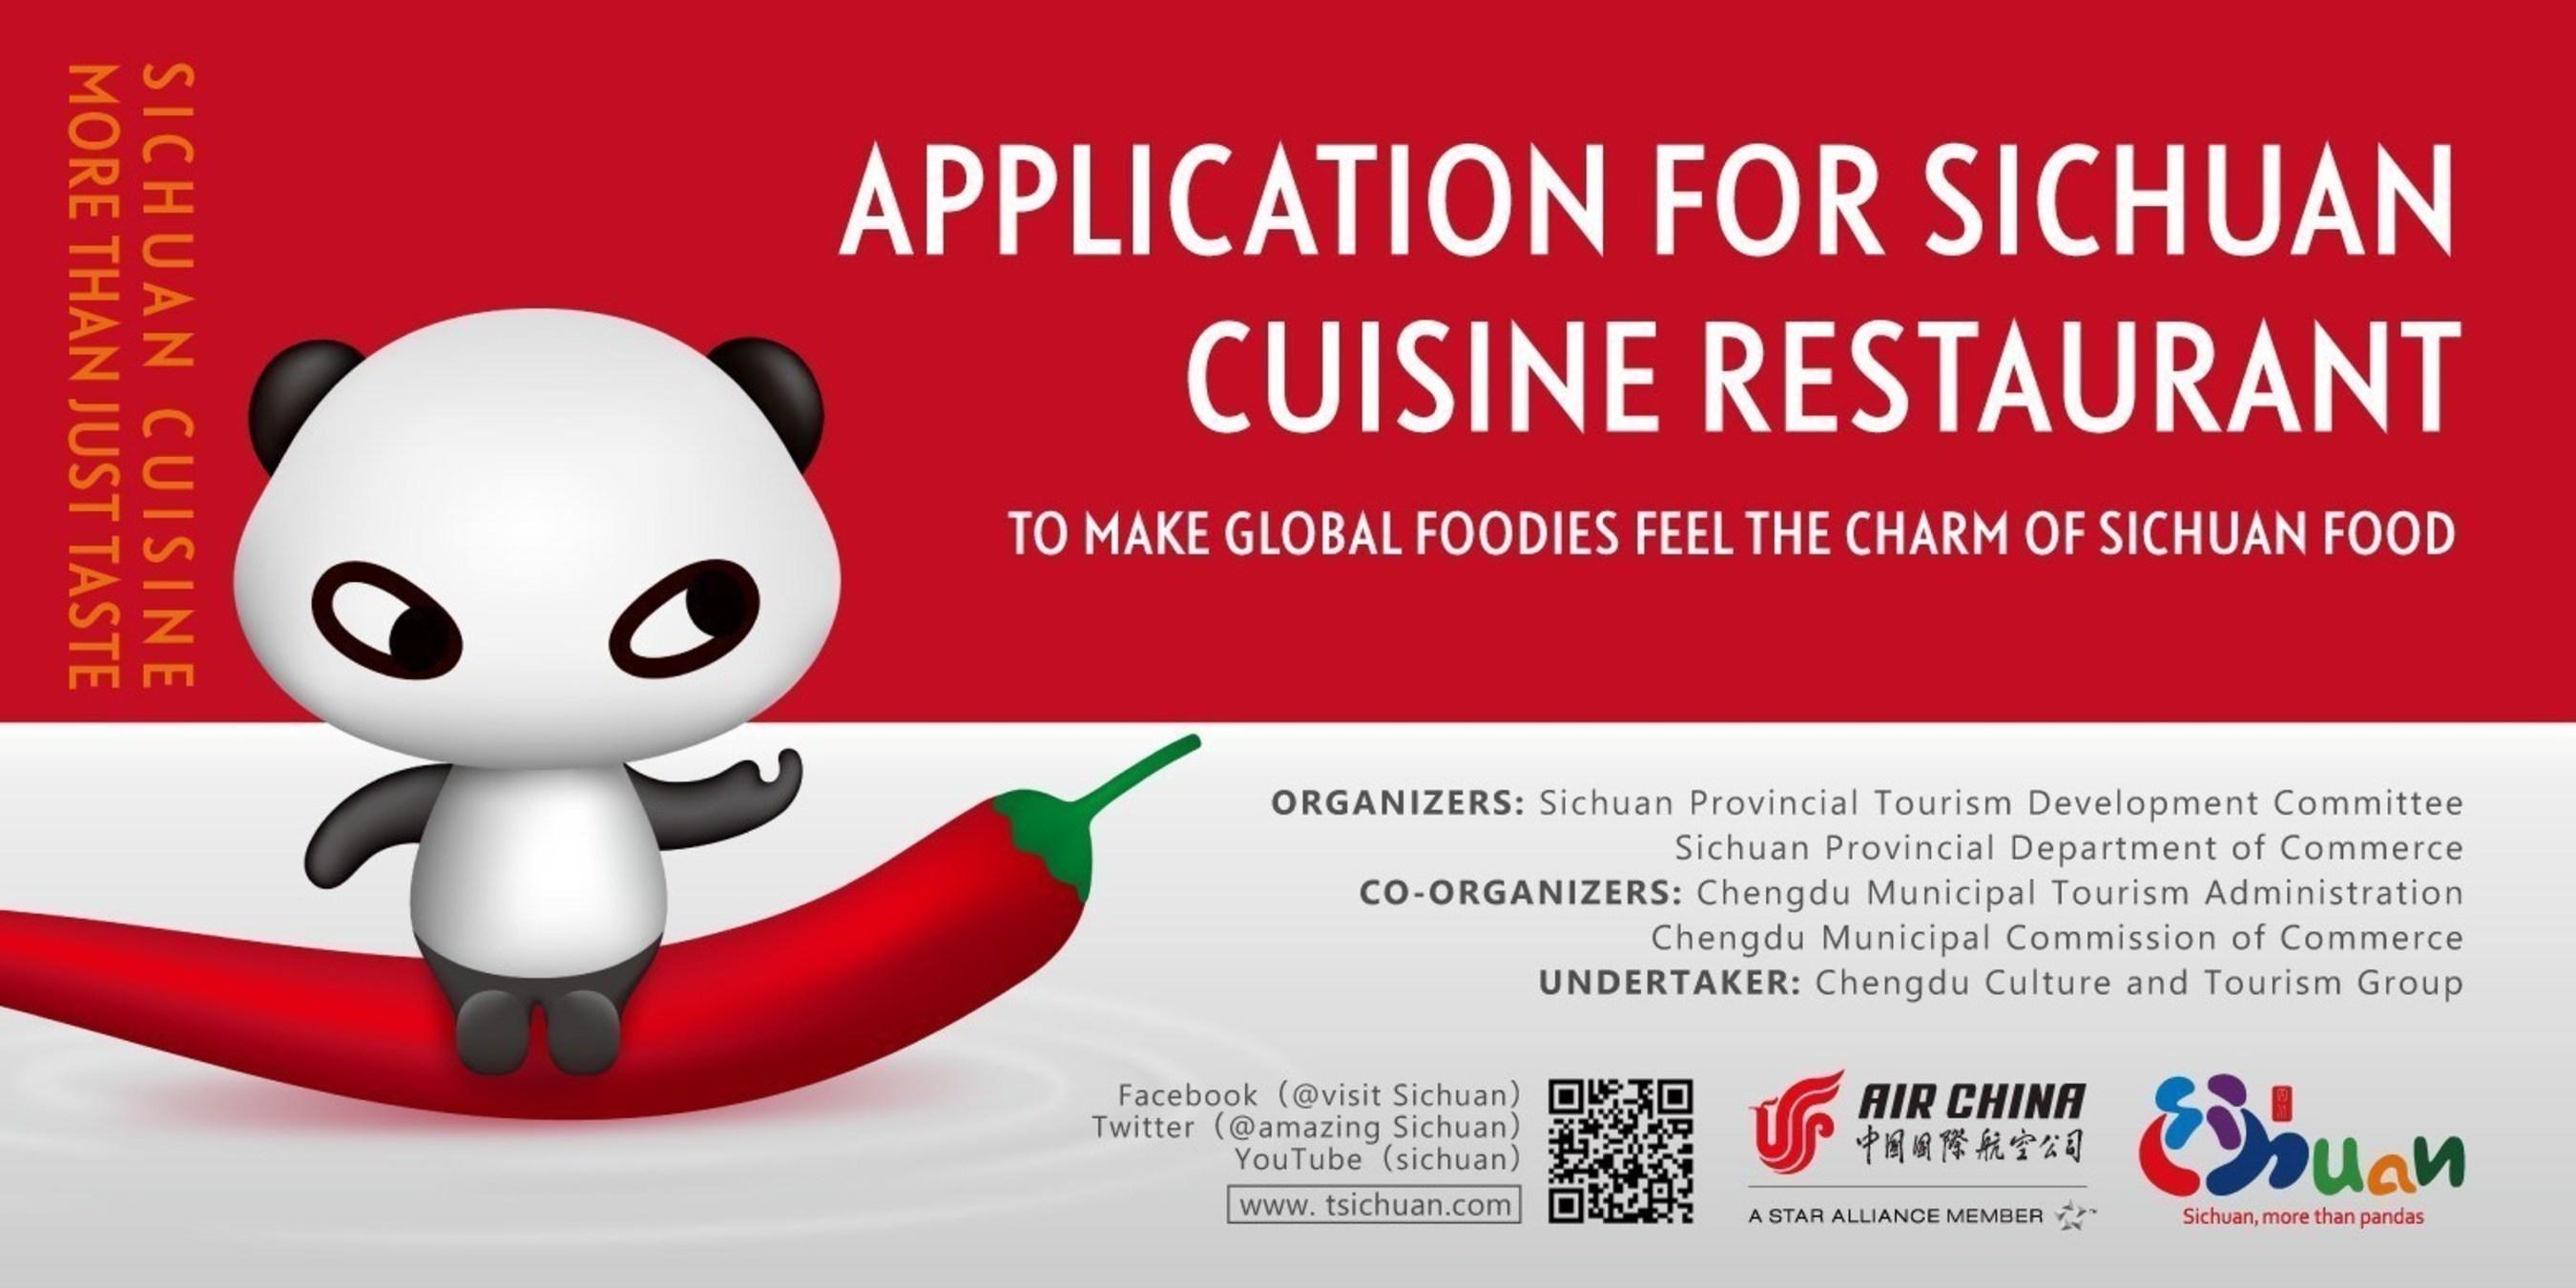 Application for Sichuan Cuisine Restaurant